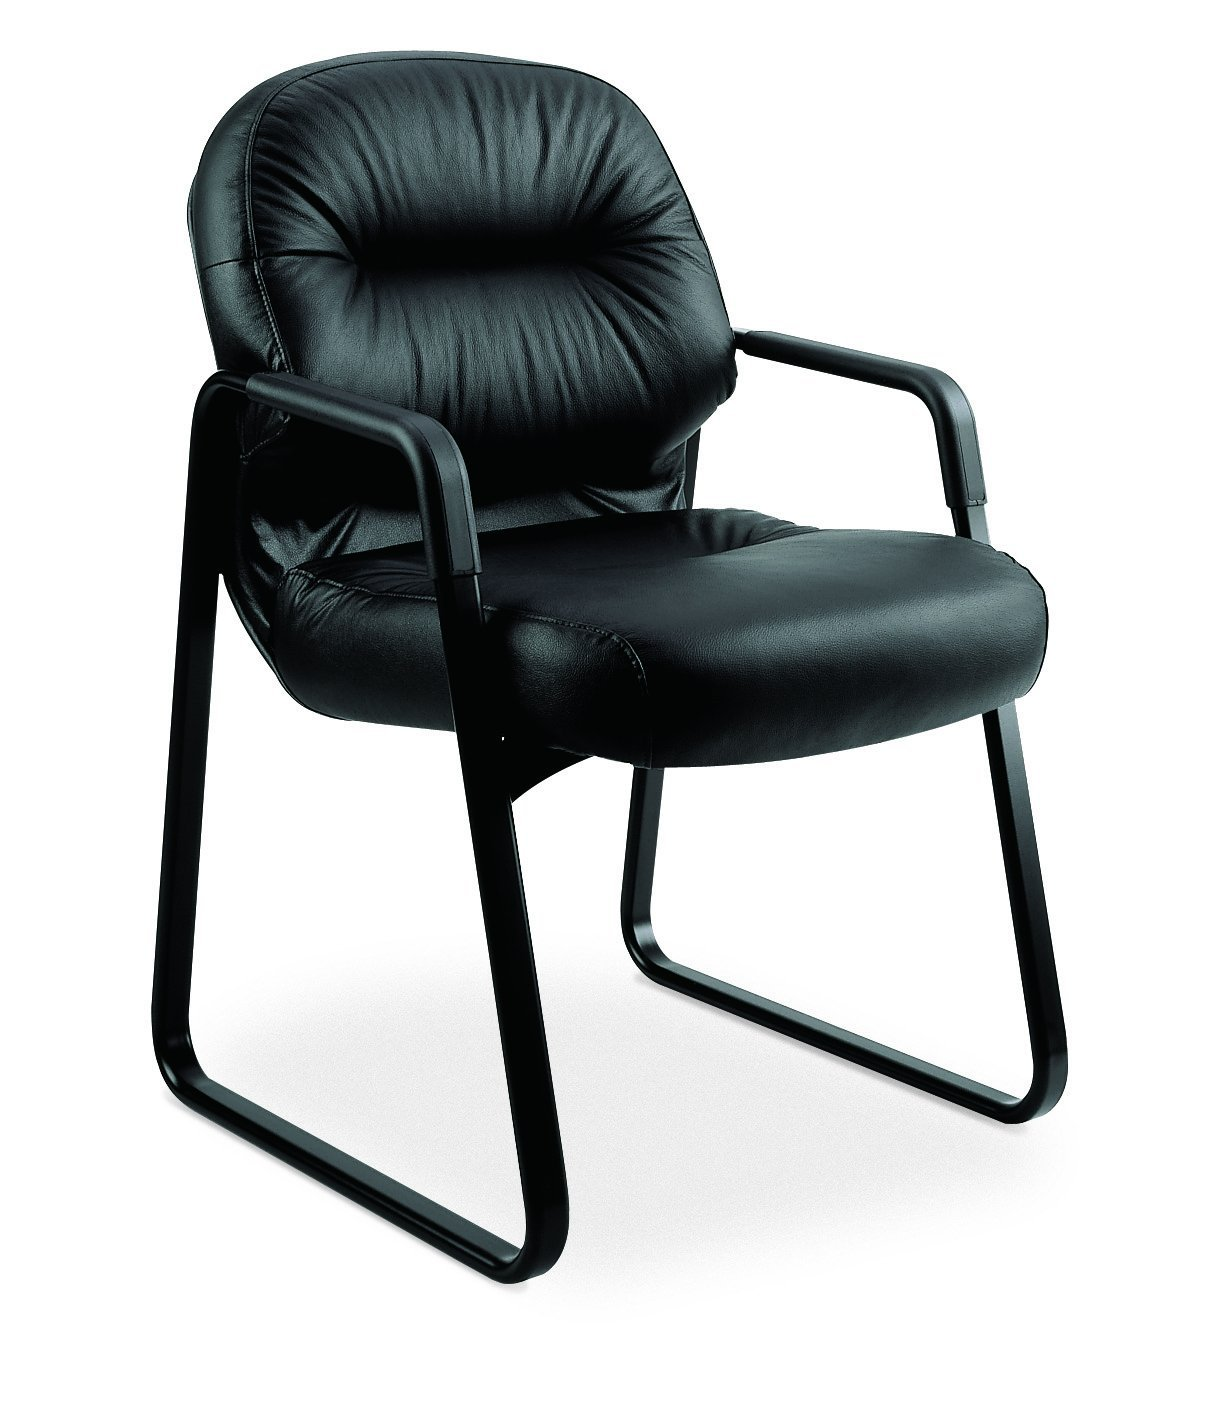 HON 2093SR11T Leather 2090 Pillow-Soft Series Guest Arm Chair, Black